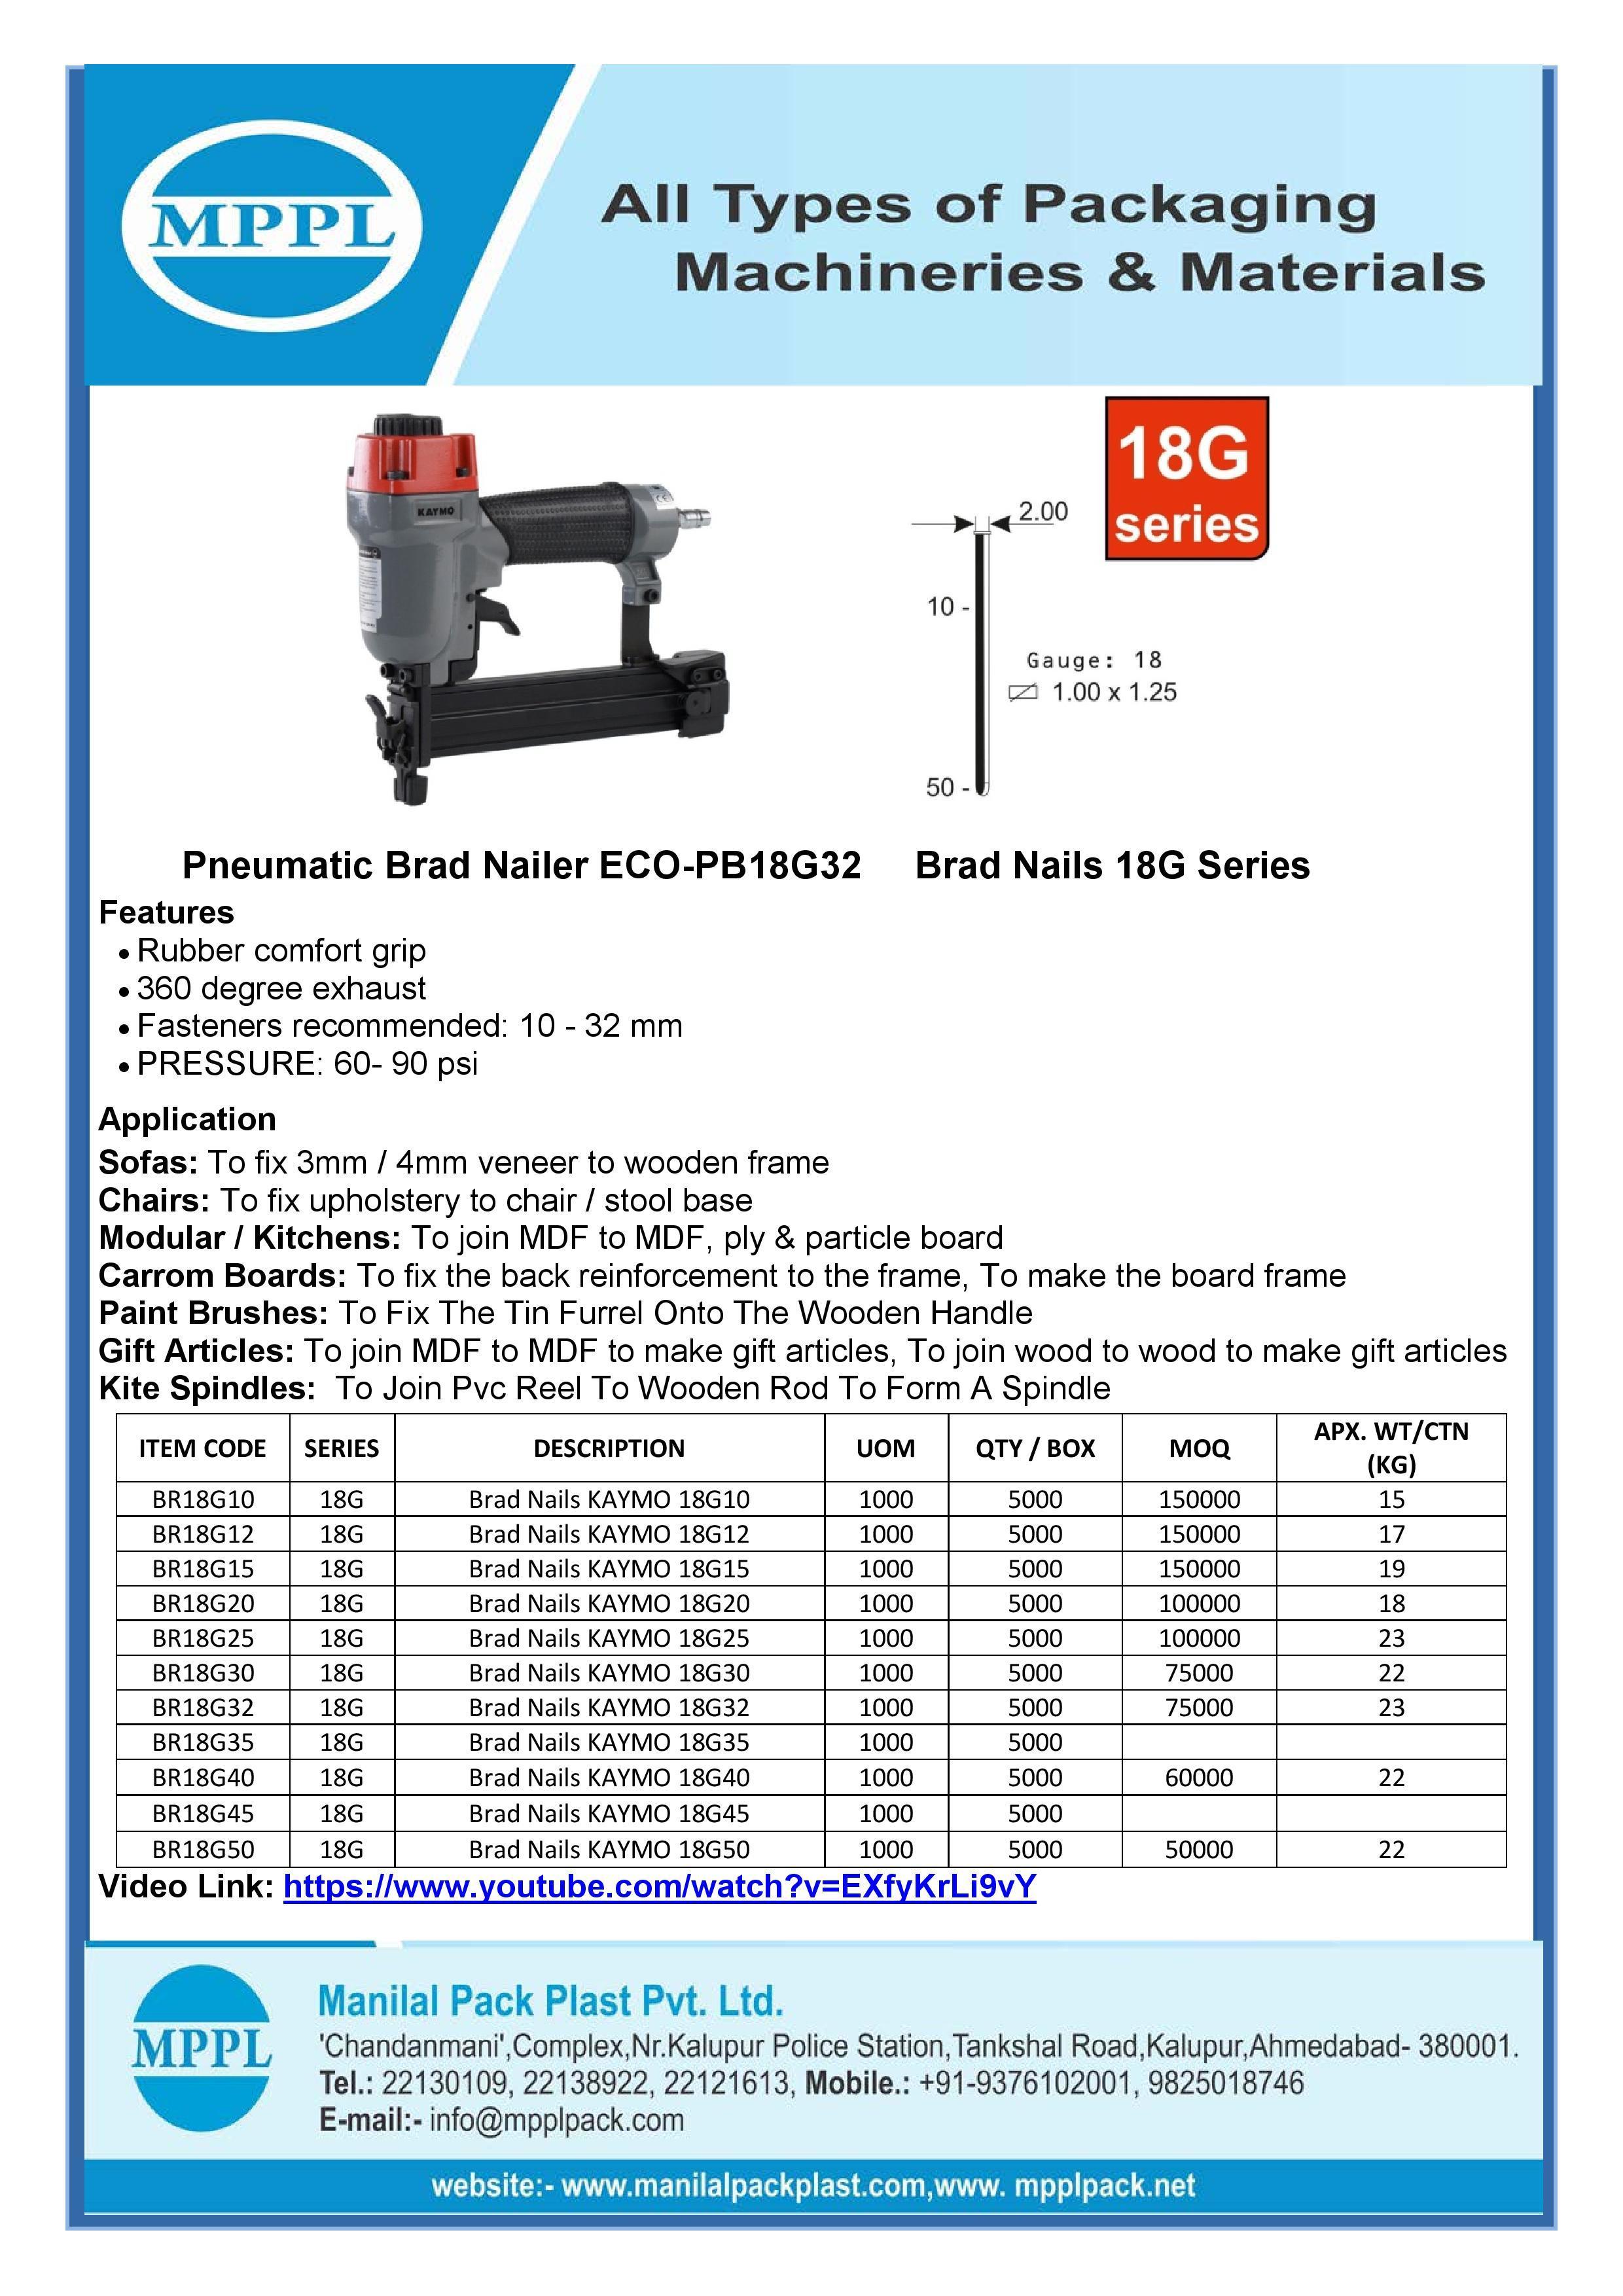 Pneumatic Brad Nailer ECO-PB18G32